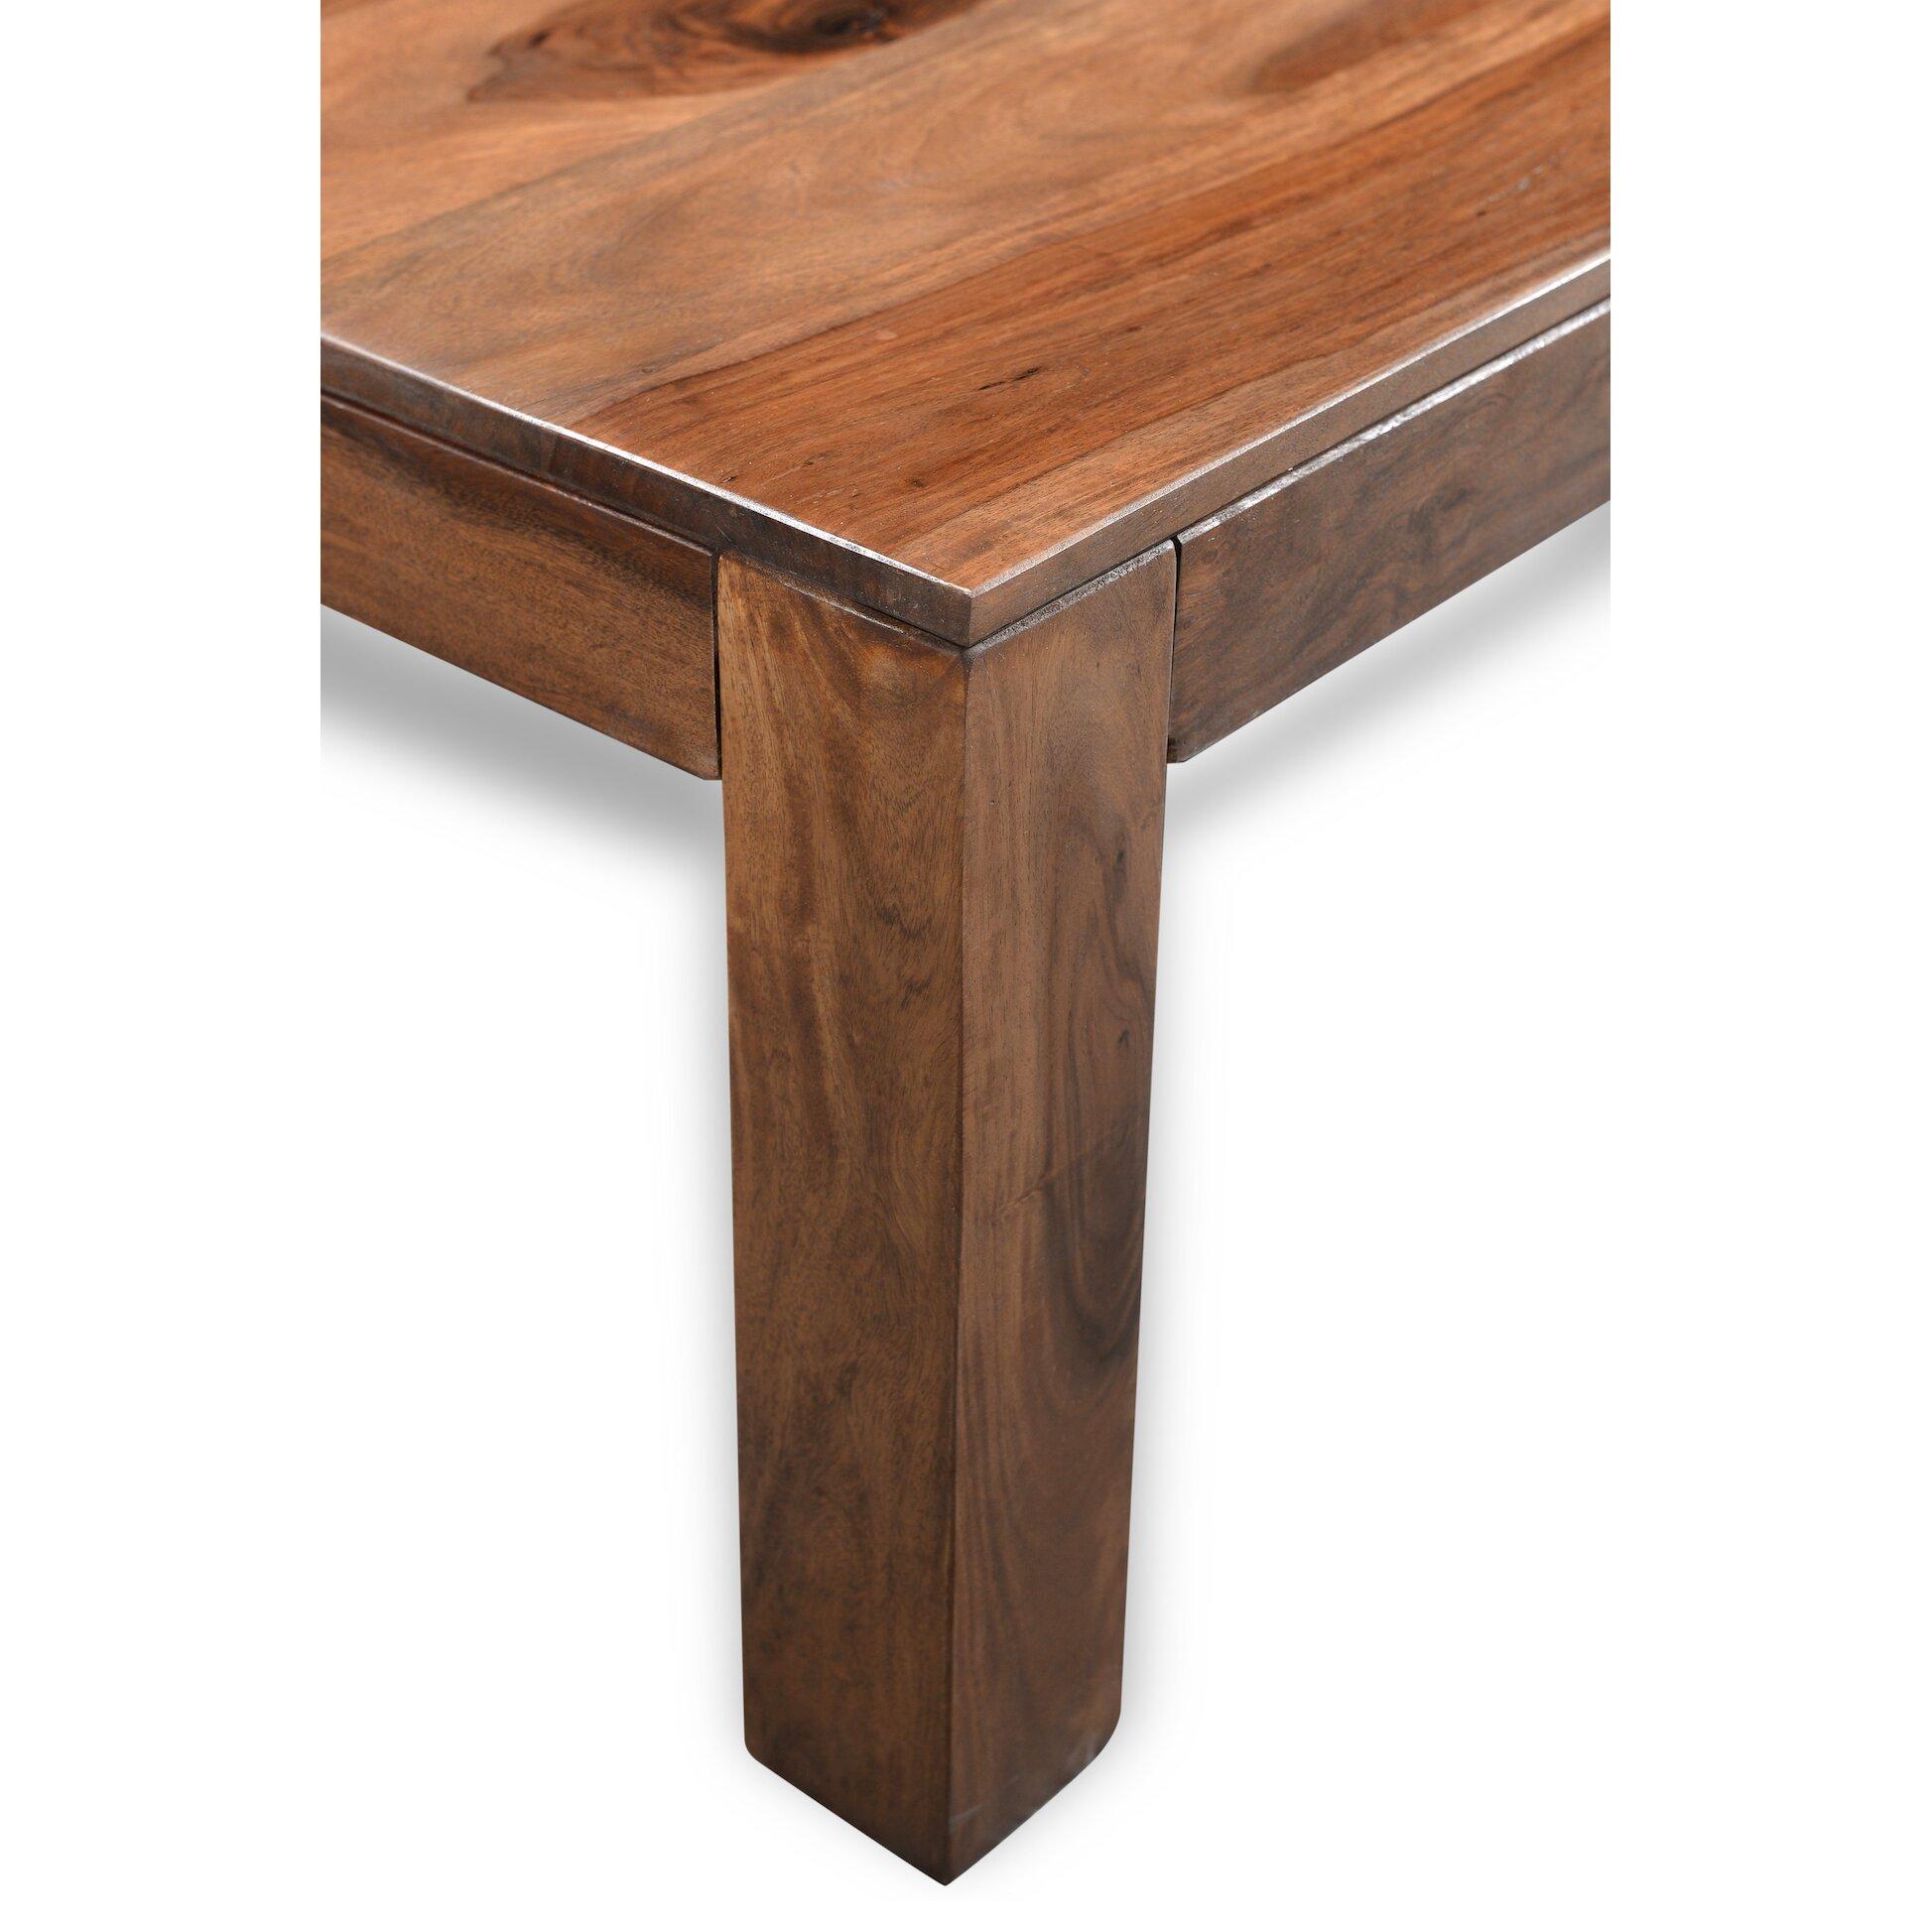 Https Www Wayfair Com Timbergirl Cube Coffee Table Aa1299 Tbgl1068 Html